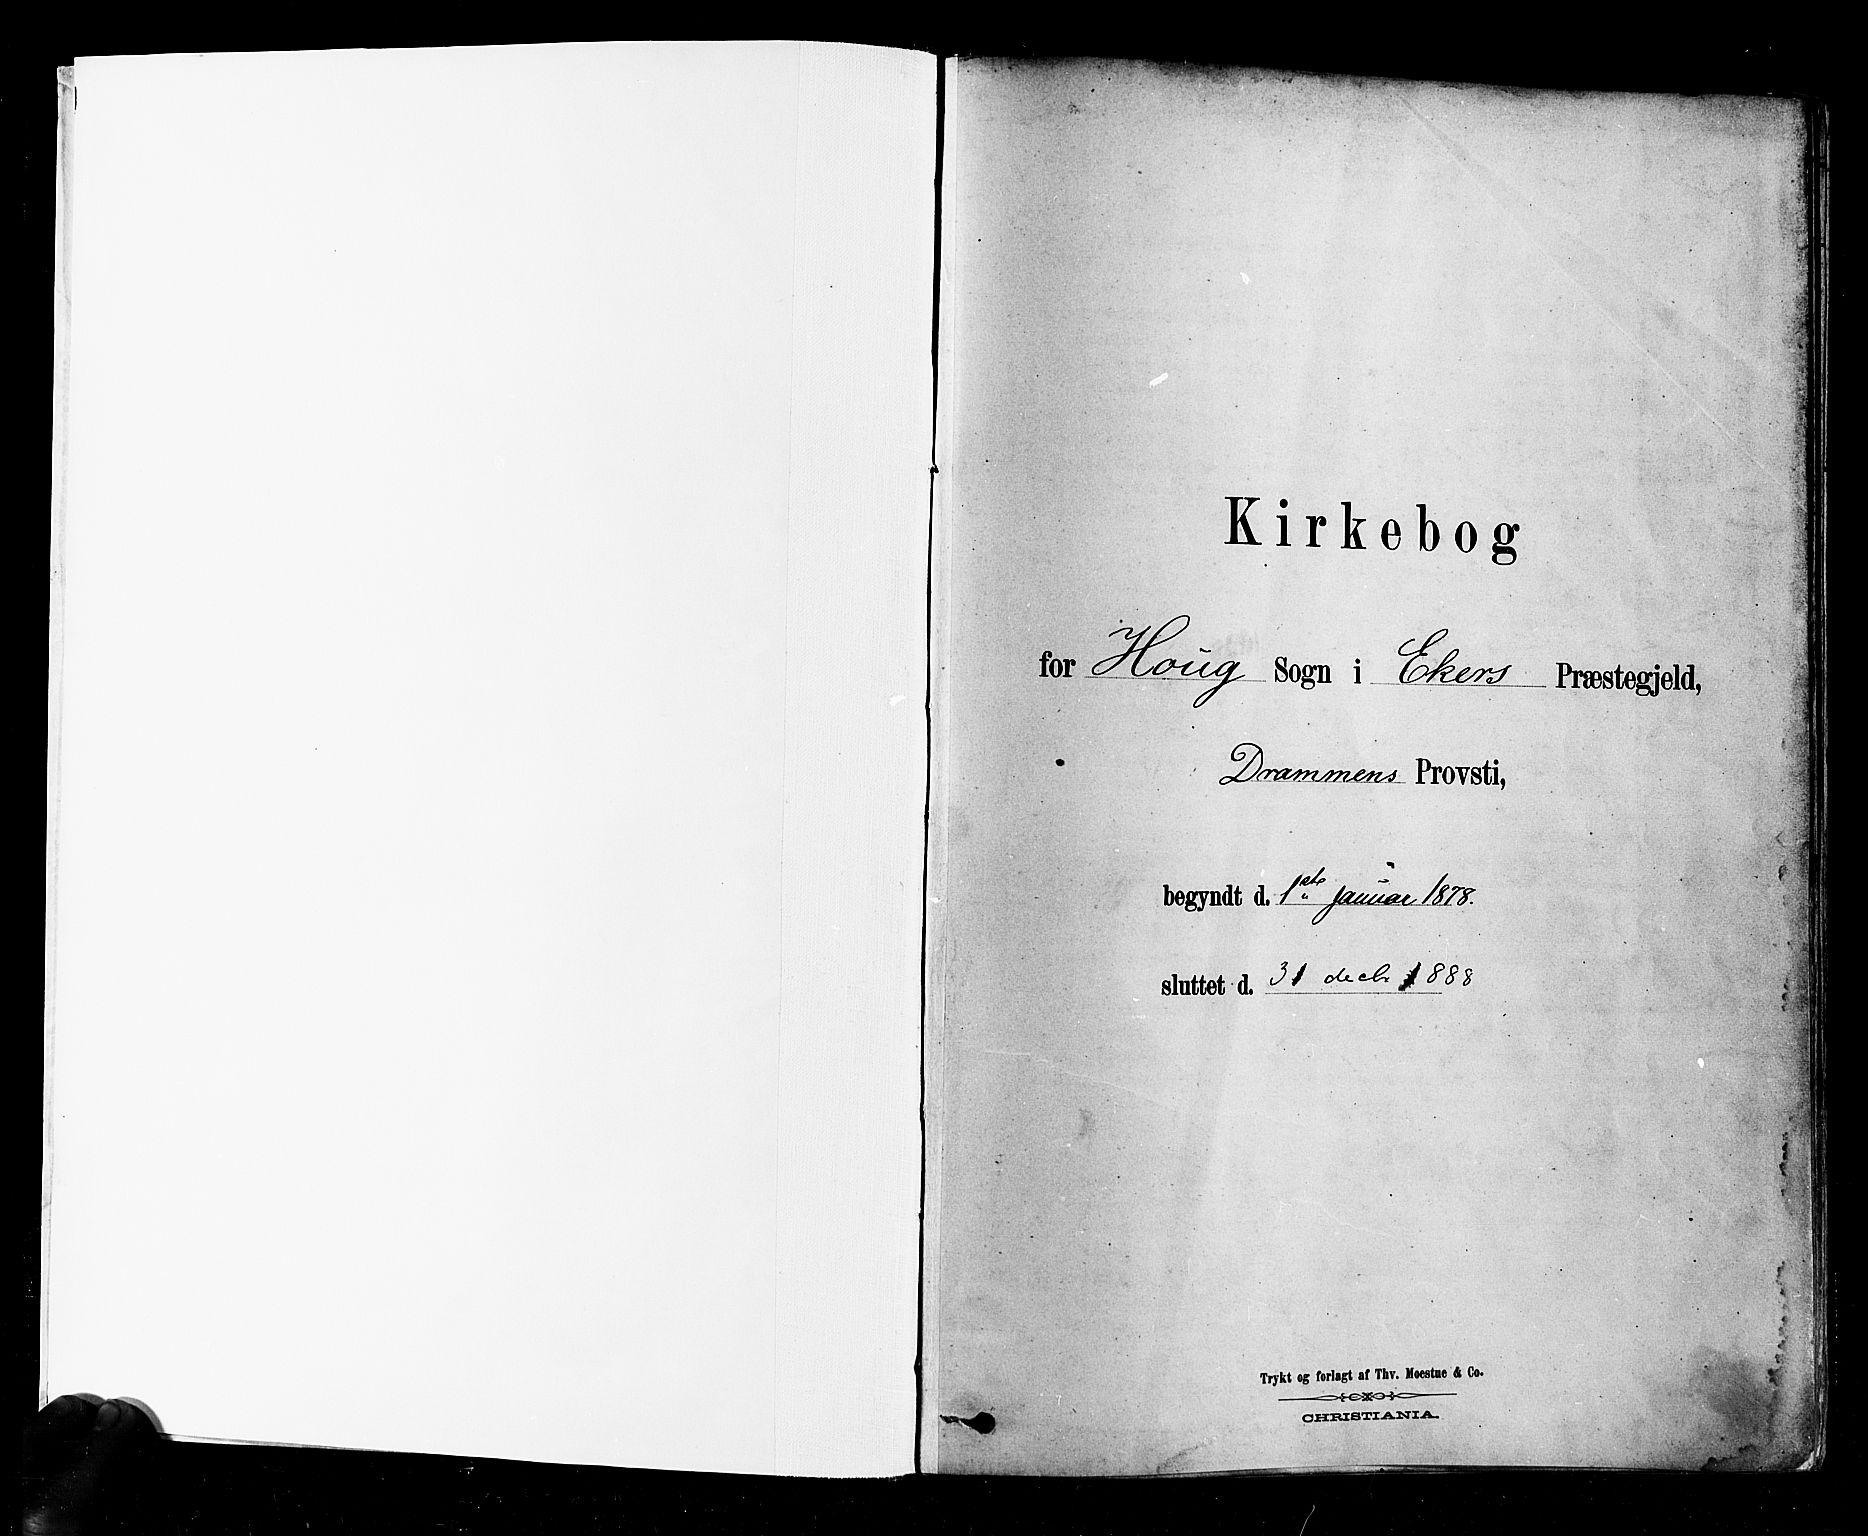 SAKO, Eiker kirkebøker, F/Fb/L0001: Ministerialbok nr. II 1, 1878-1888